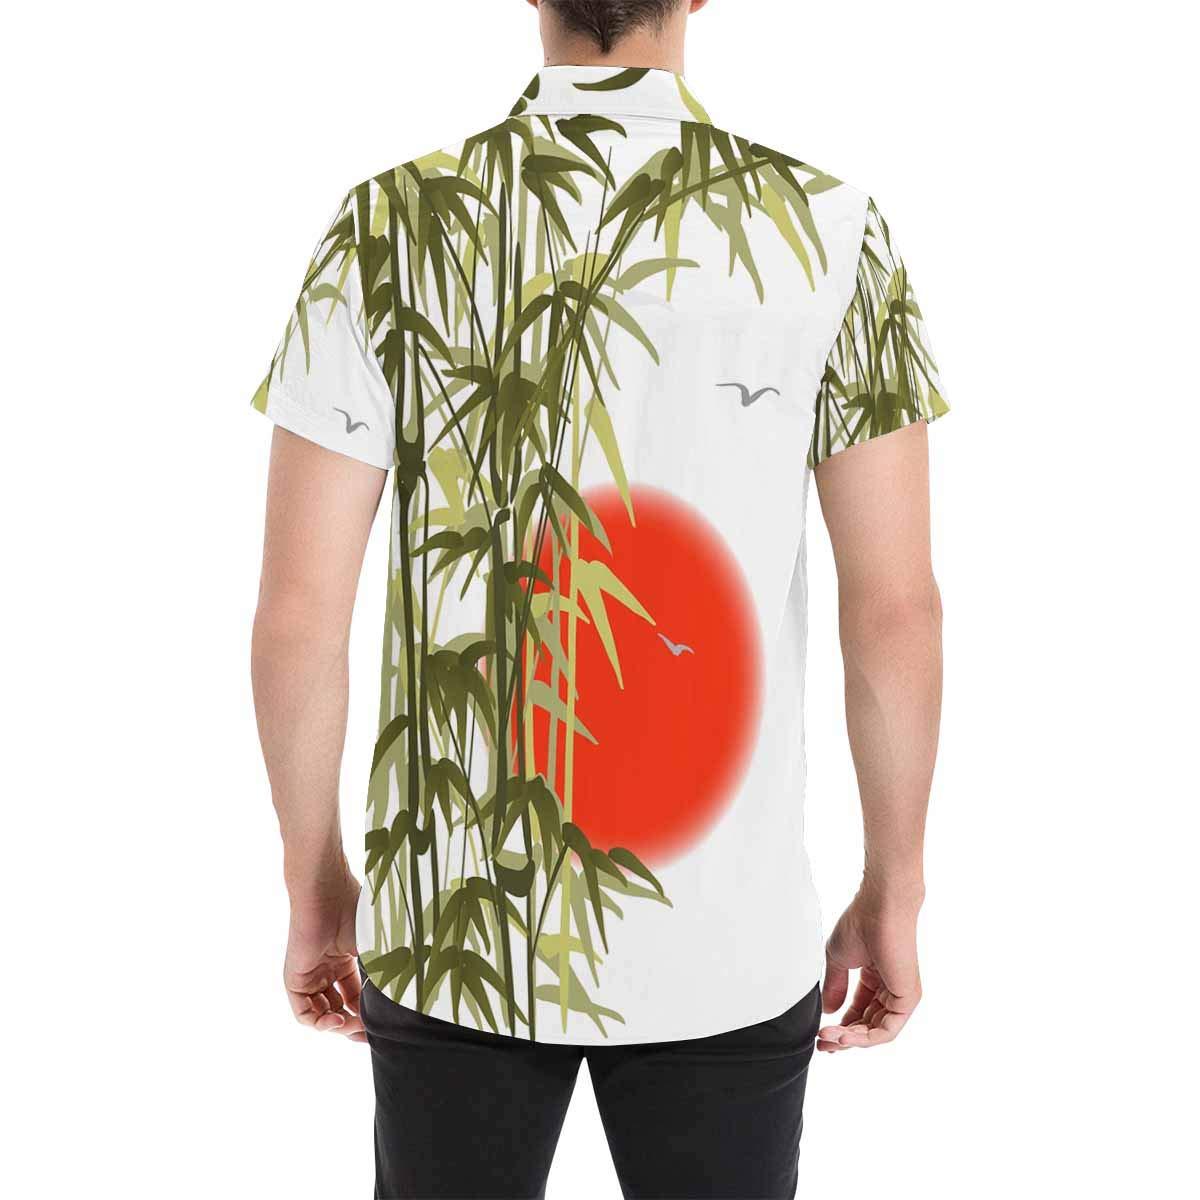 InterestPrint Fashion Printed Roses and Sugar Skulls Stand Collar Casual T-Shirt Beach Tops S-5XL